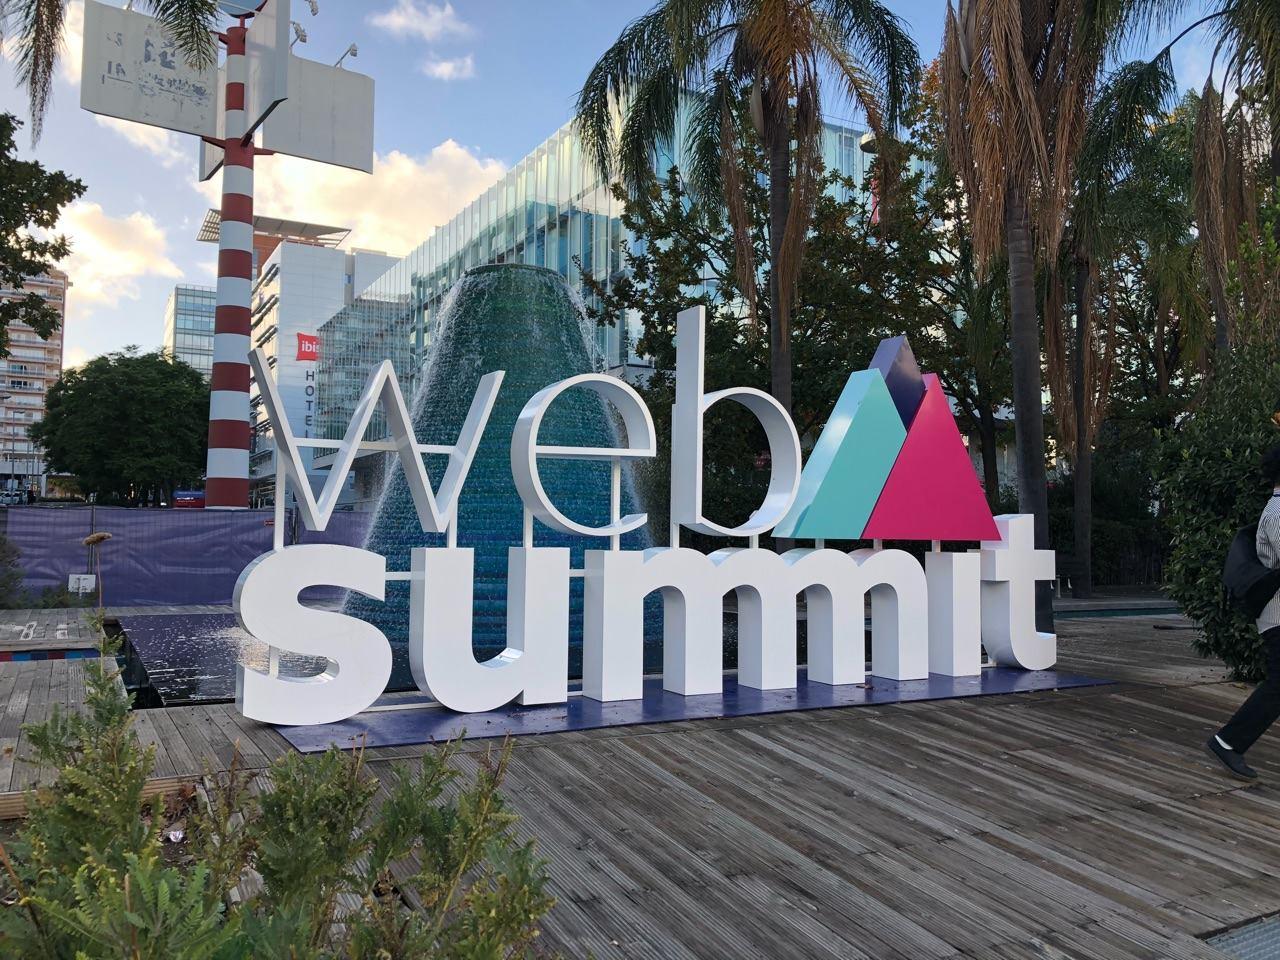 Web Summit - Lisbon 2018